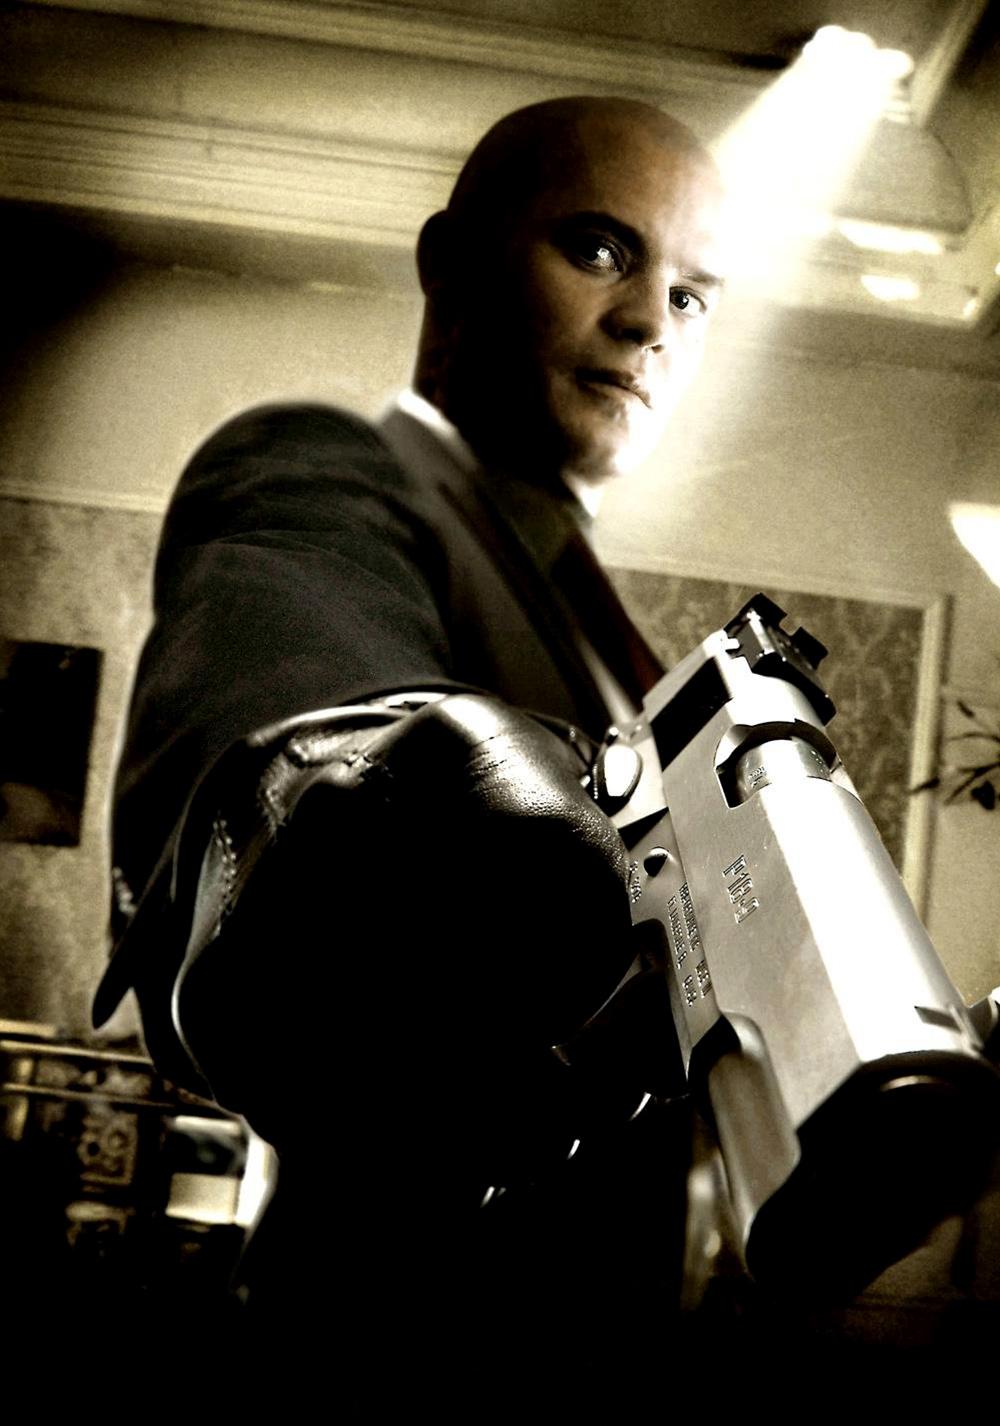 Hitman | Movie fanart | fanart.tv